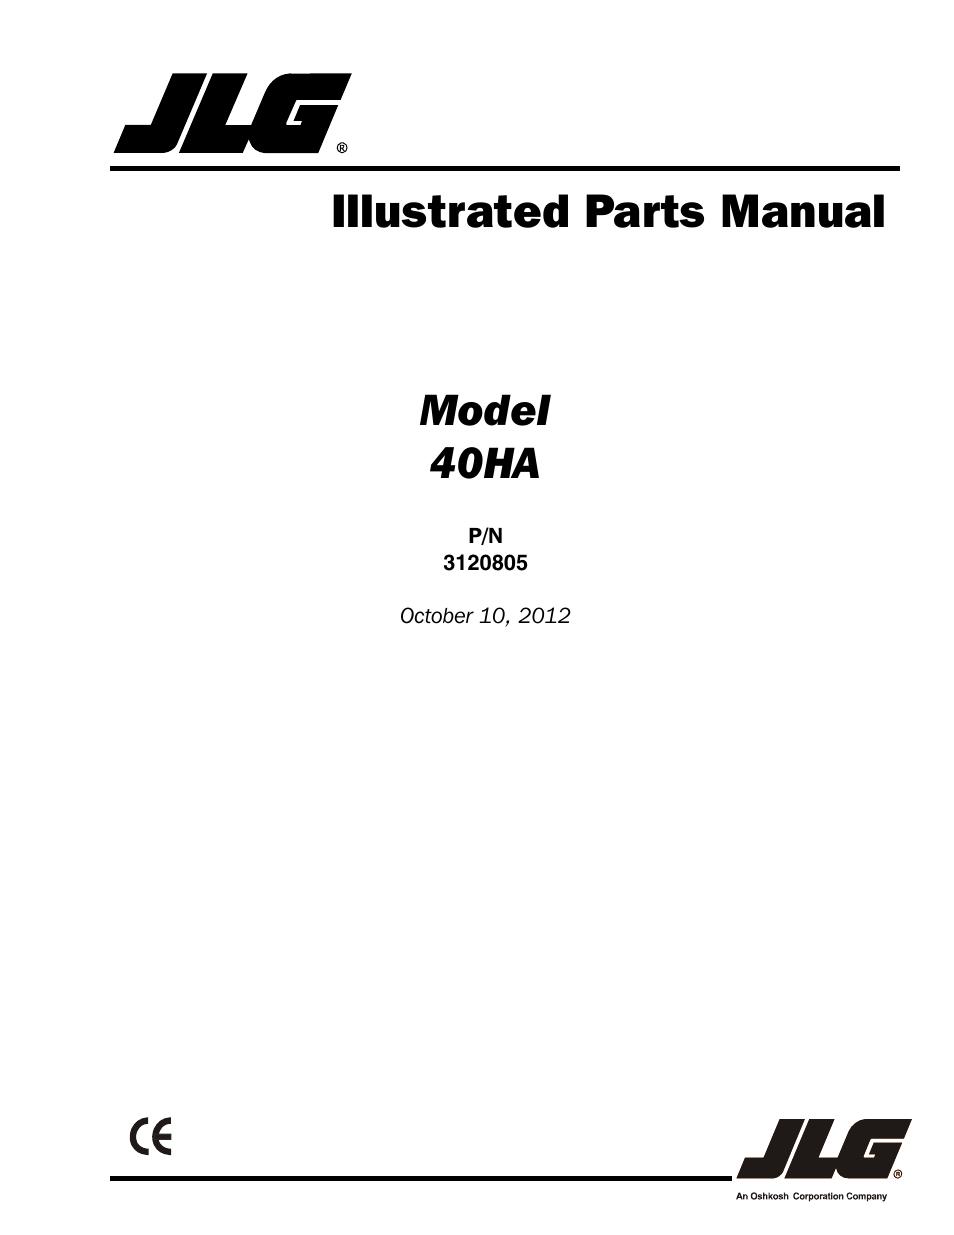 jlg 40ha parts manual user manual